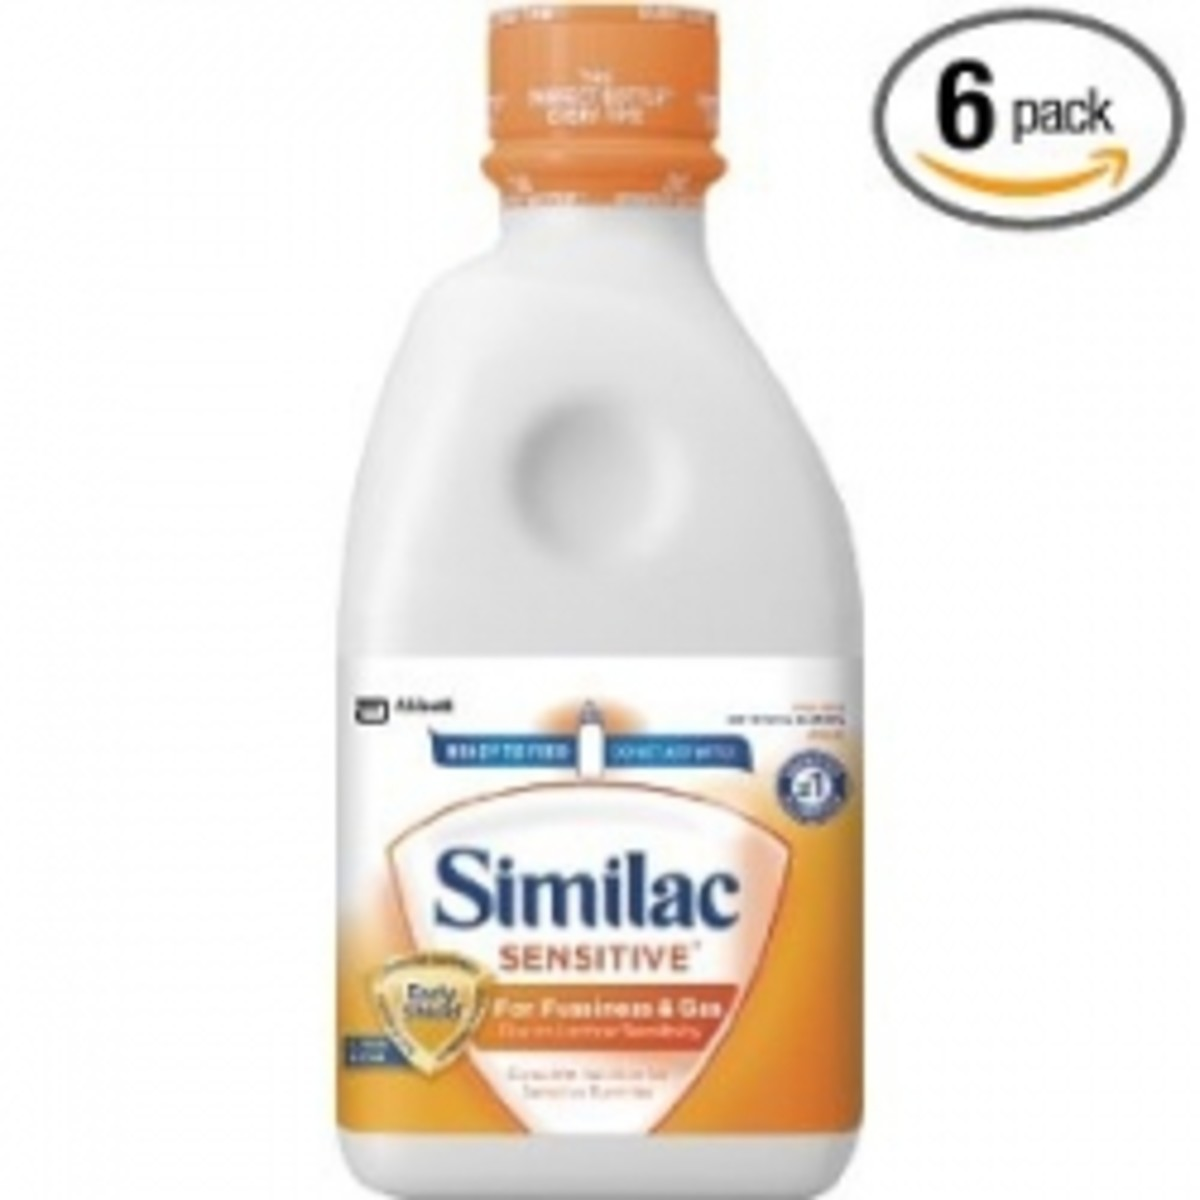 Similac Sensitive Reviews